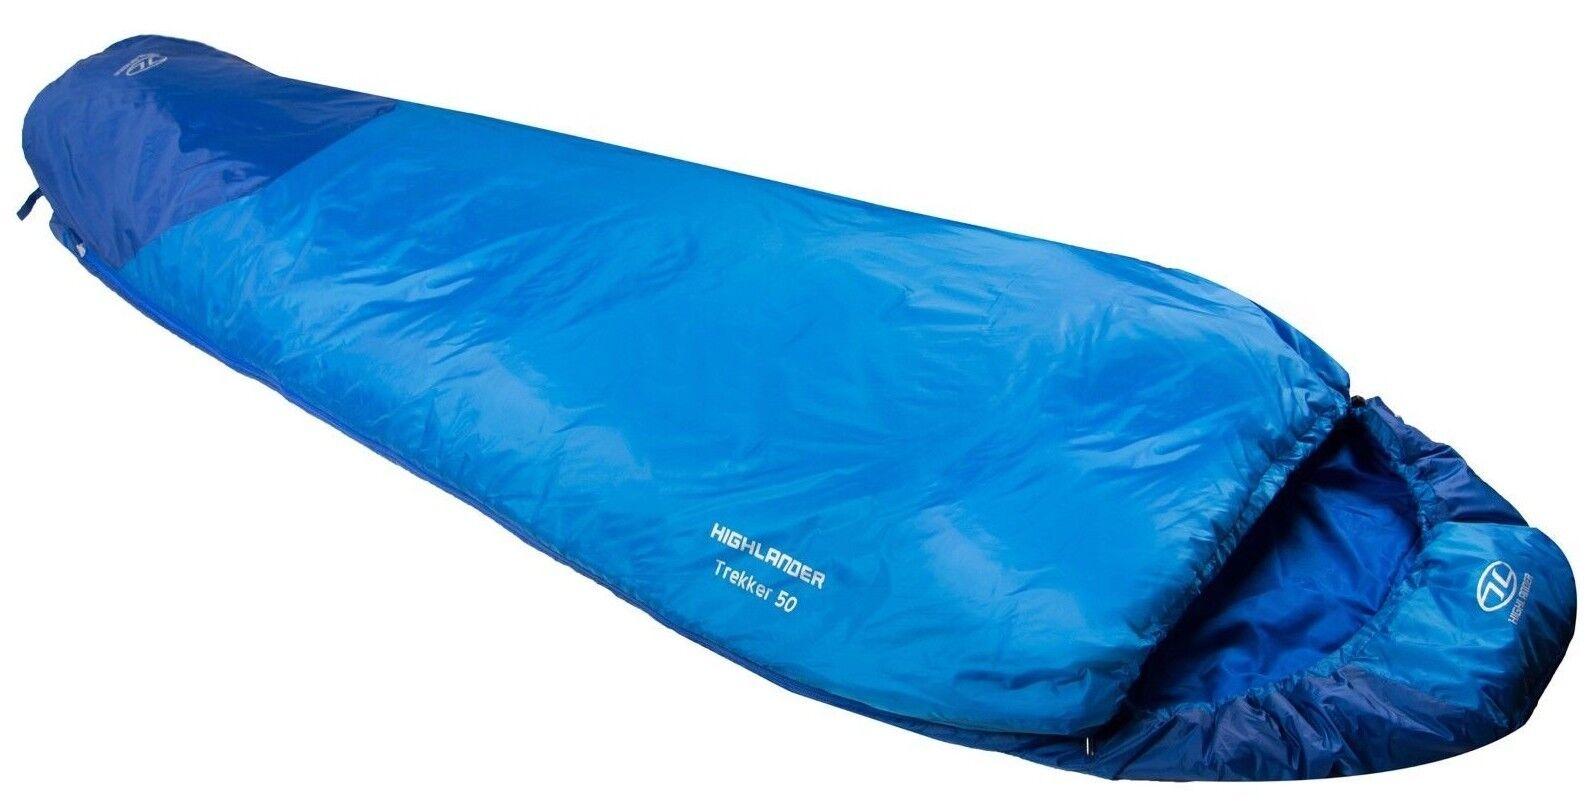 Highlander Trekker 50 Sleeping Bag Superlite Mummy 1 Season bluee + Mosquito Net